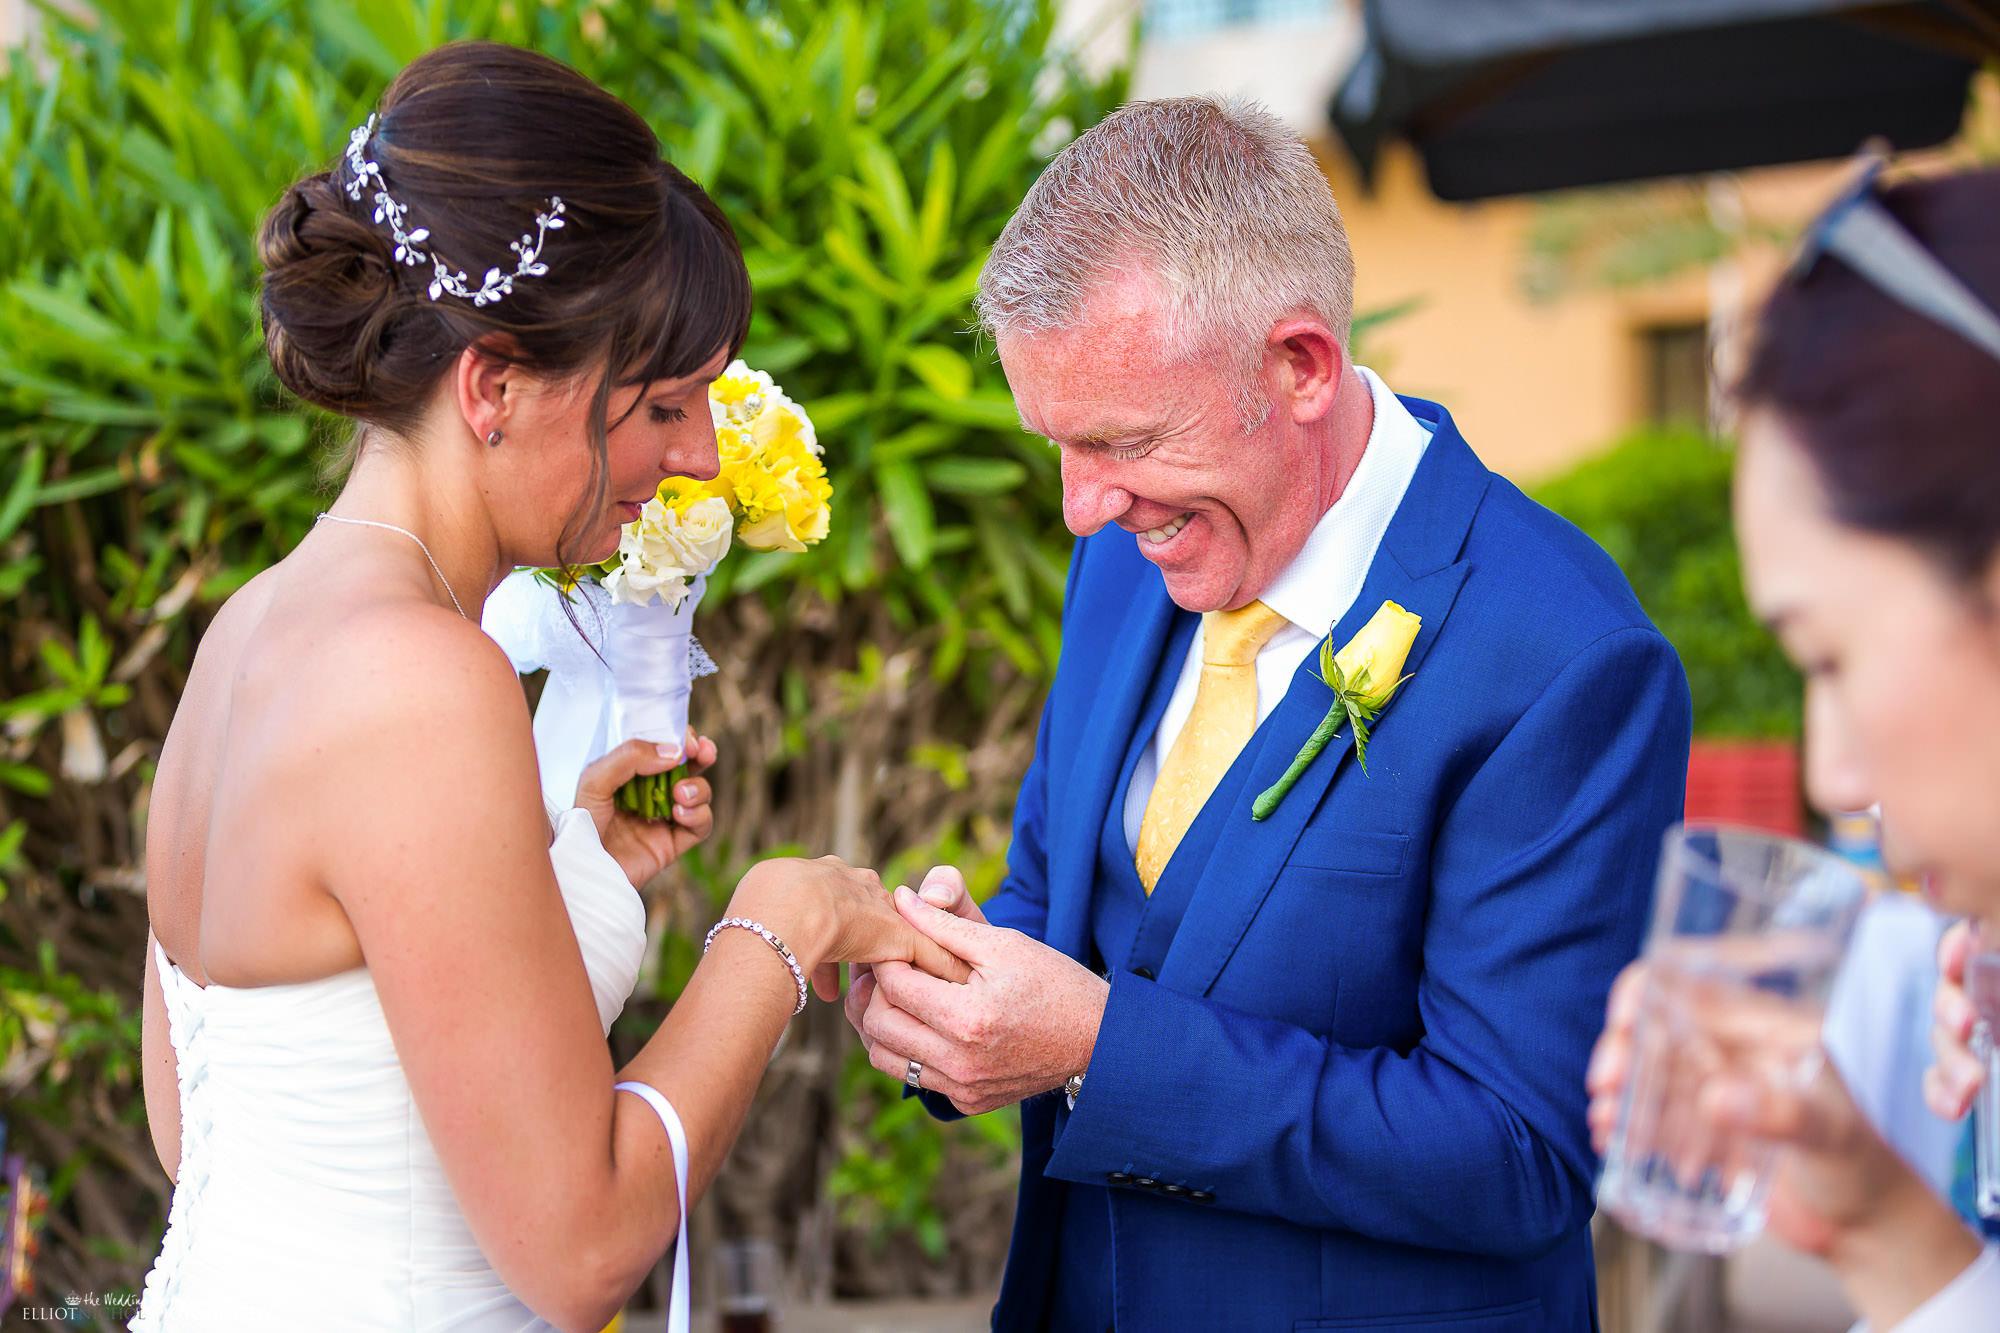 bride-groom-newlyweds-ring-wedding-photography